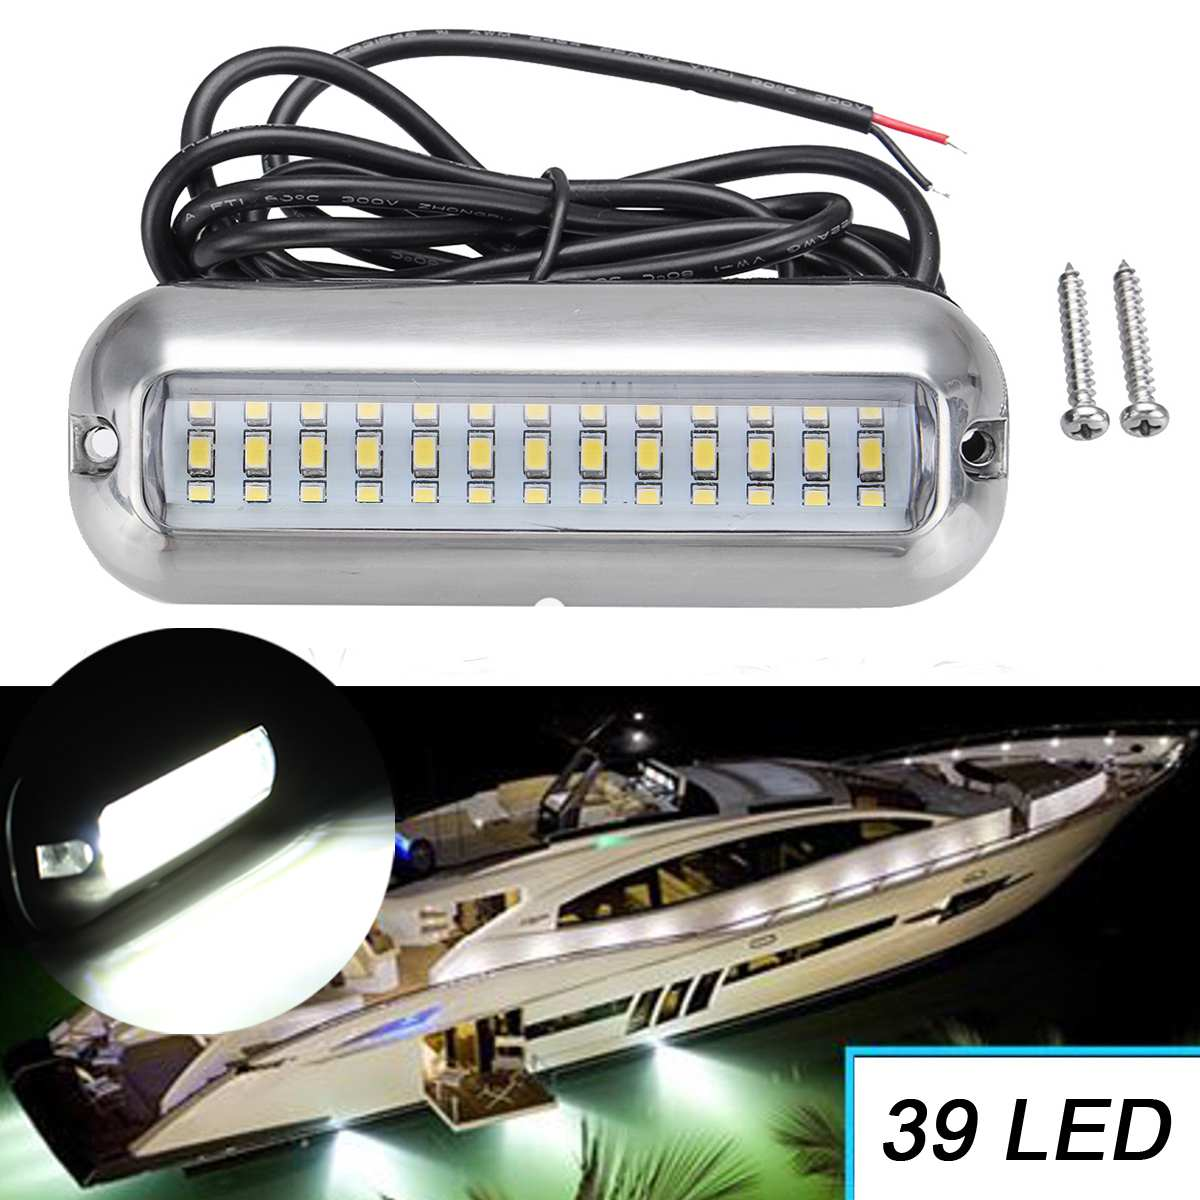 Set of 2 White Underwater Boat Marine High Intensity Stainless Steel LED lights